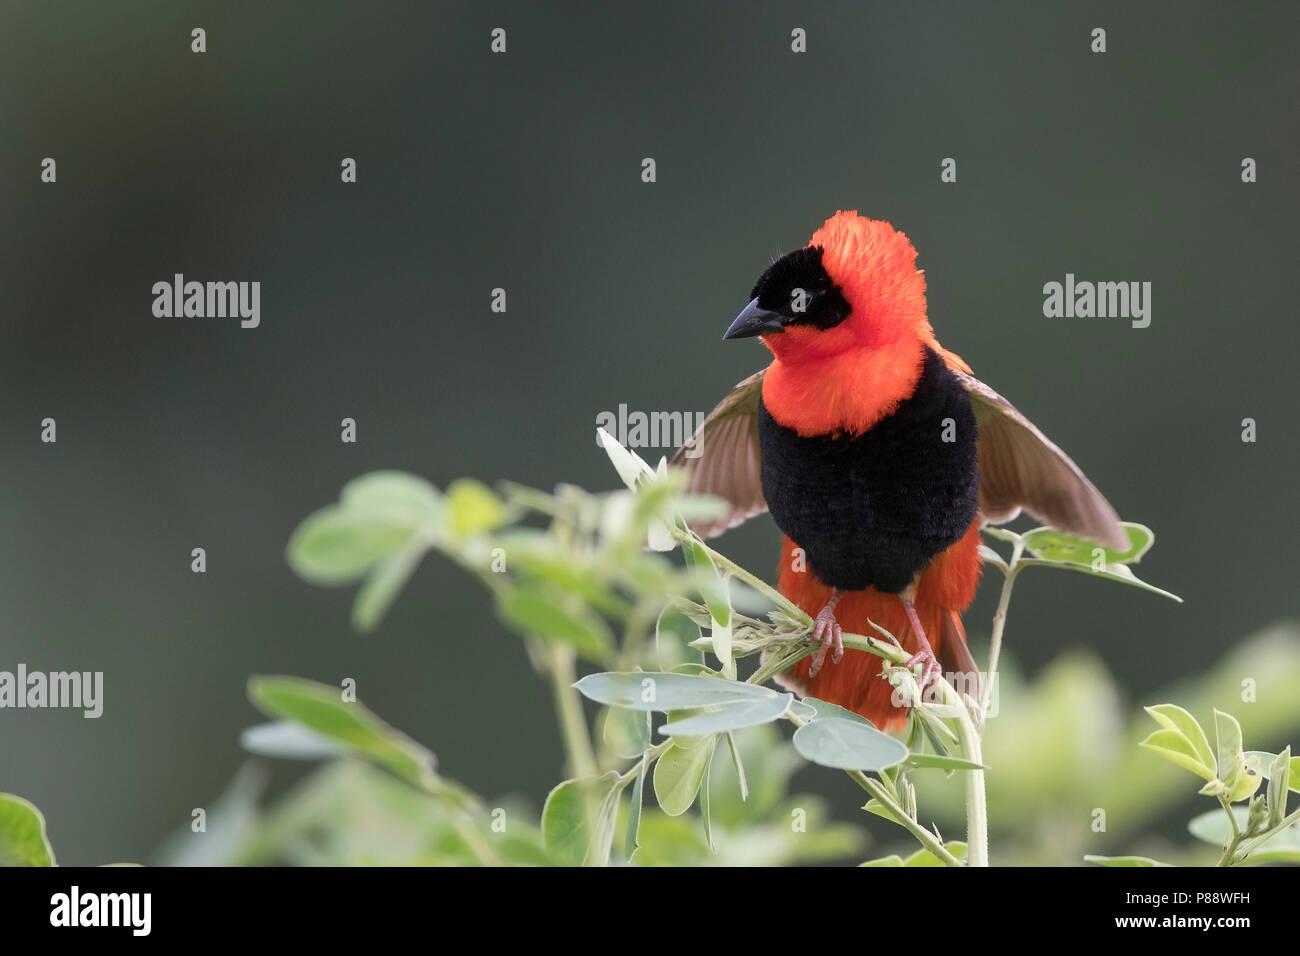 Male Northern Red Bishop (Euplectes franciscanus) in breeding plumage - Stock Image